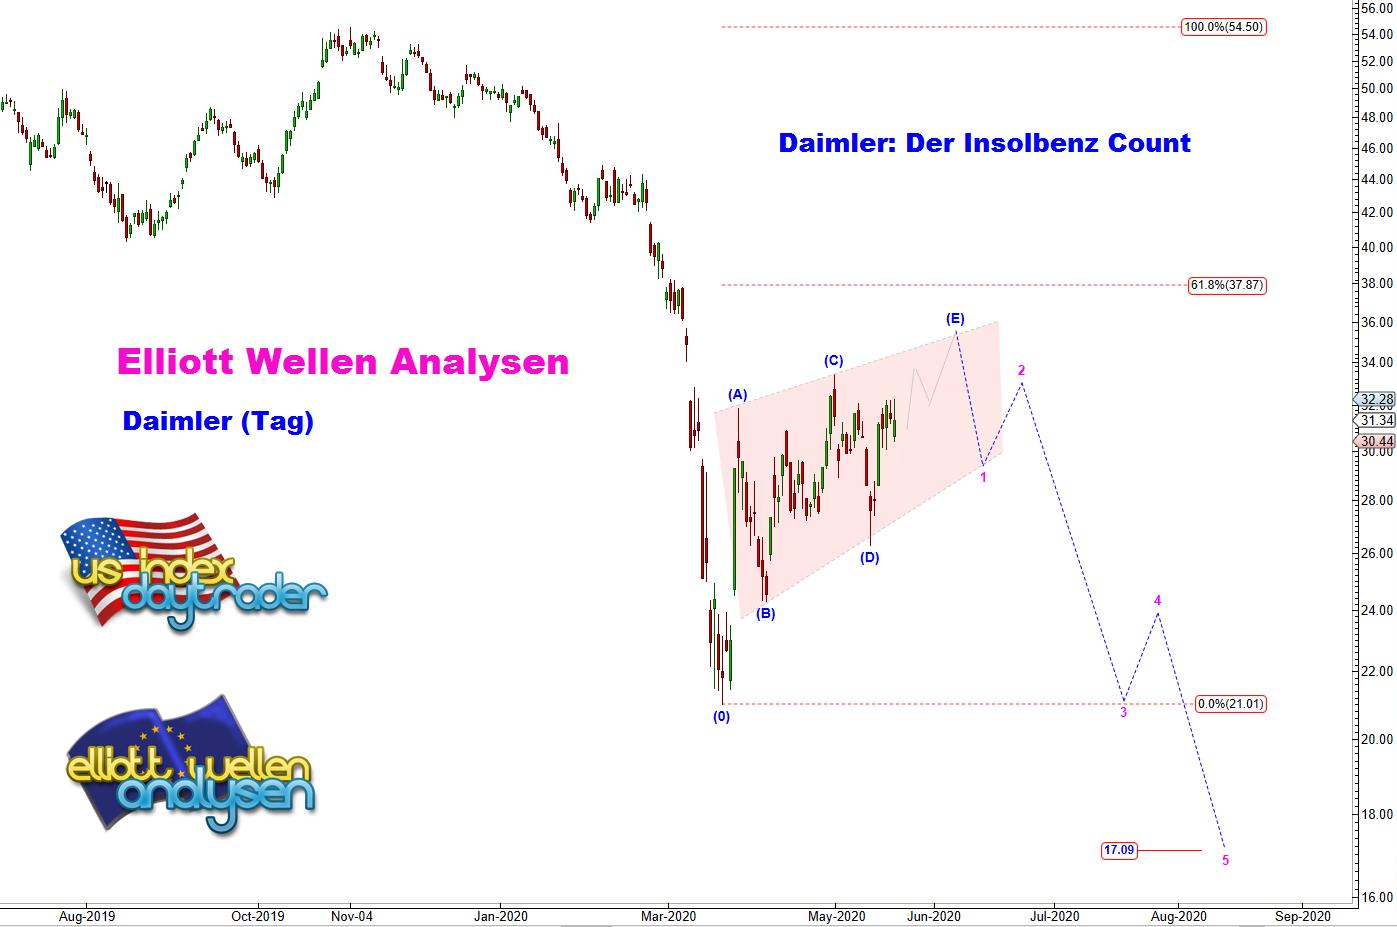 EW-Analyse-DAIMLER-Der-Insolbenz-Count-André-Tiedje-GodmodeTrader.de-1